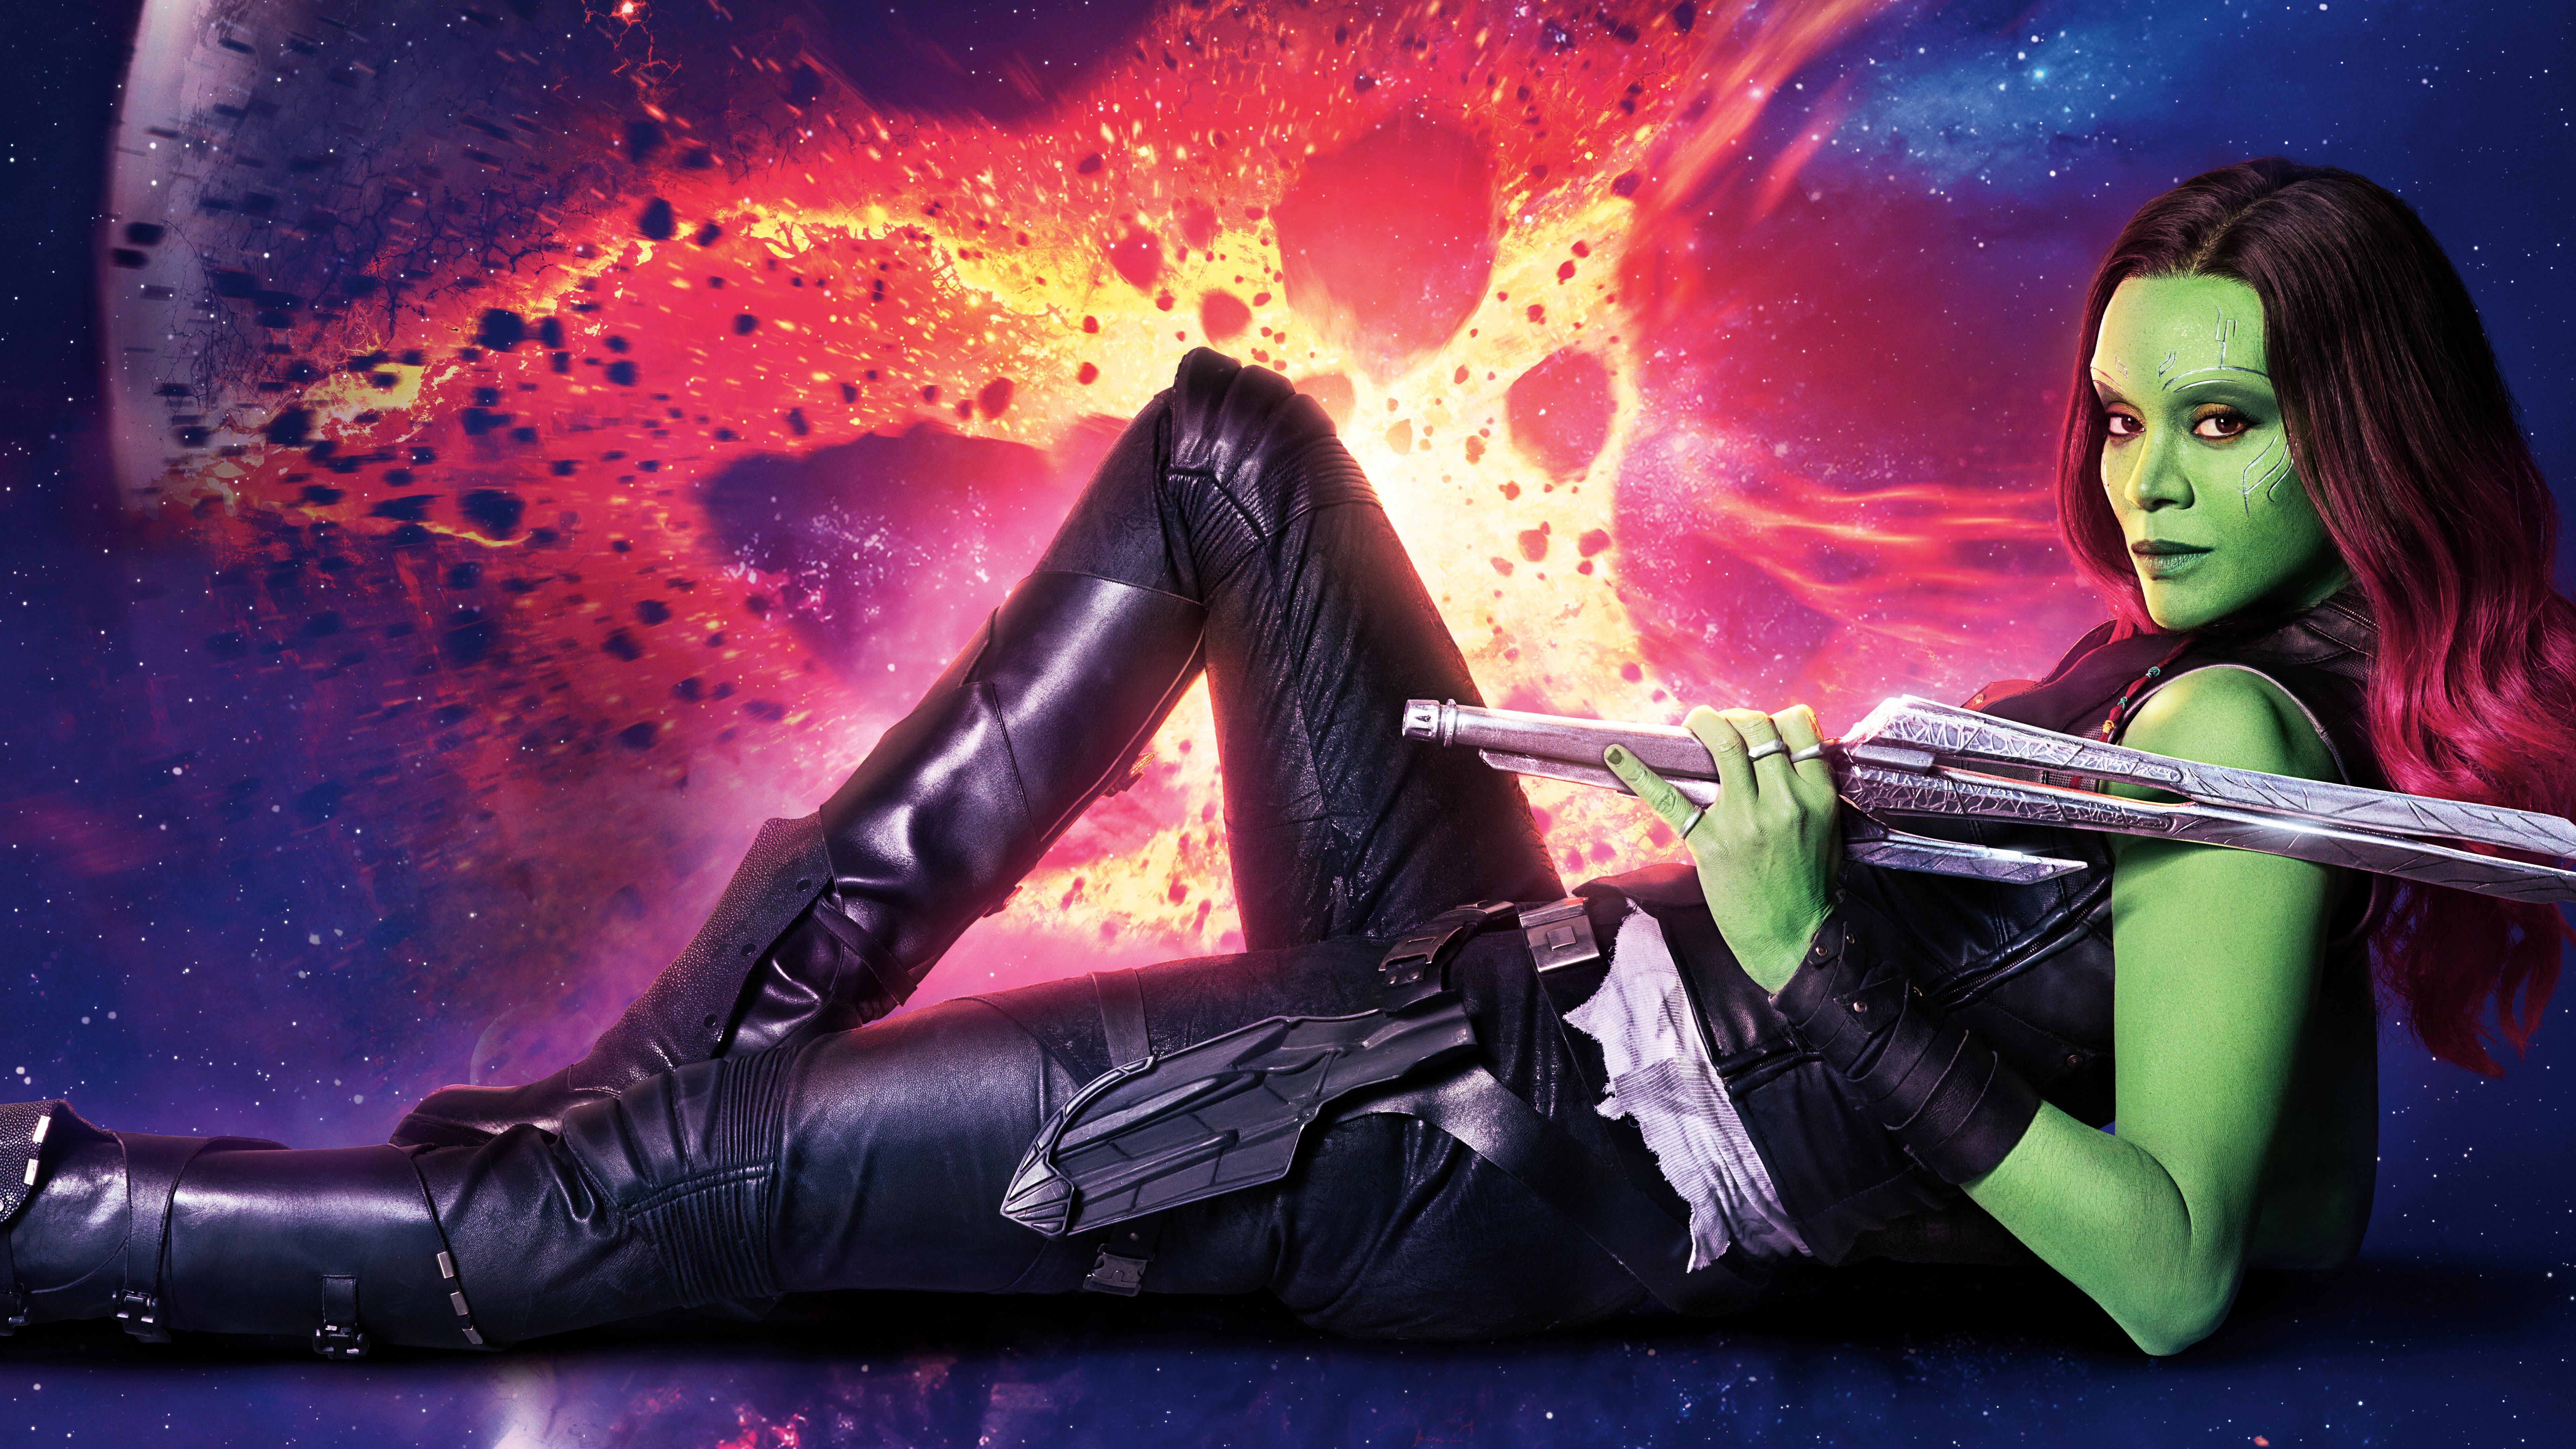 gamora-guardians-of-the-galaxy-vol-2-cast-10k-ap.jpg